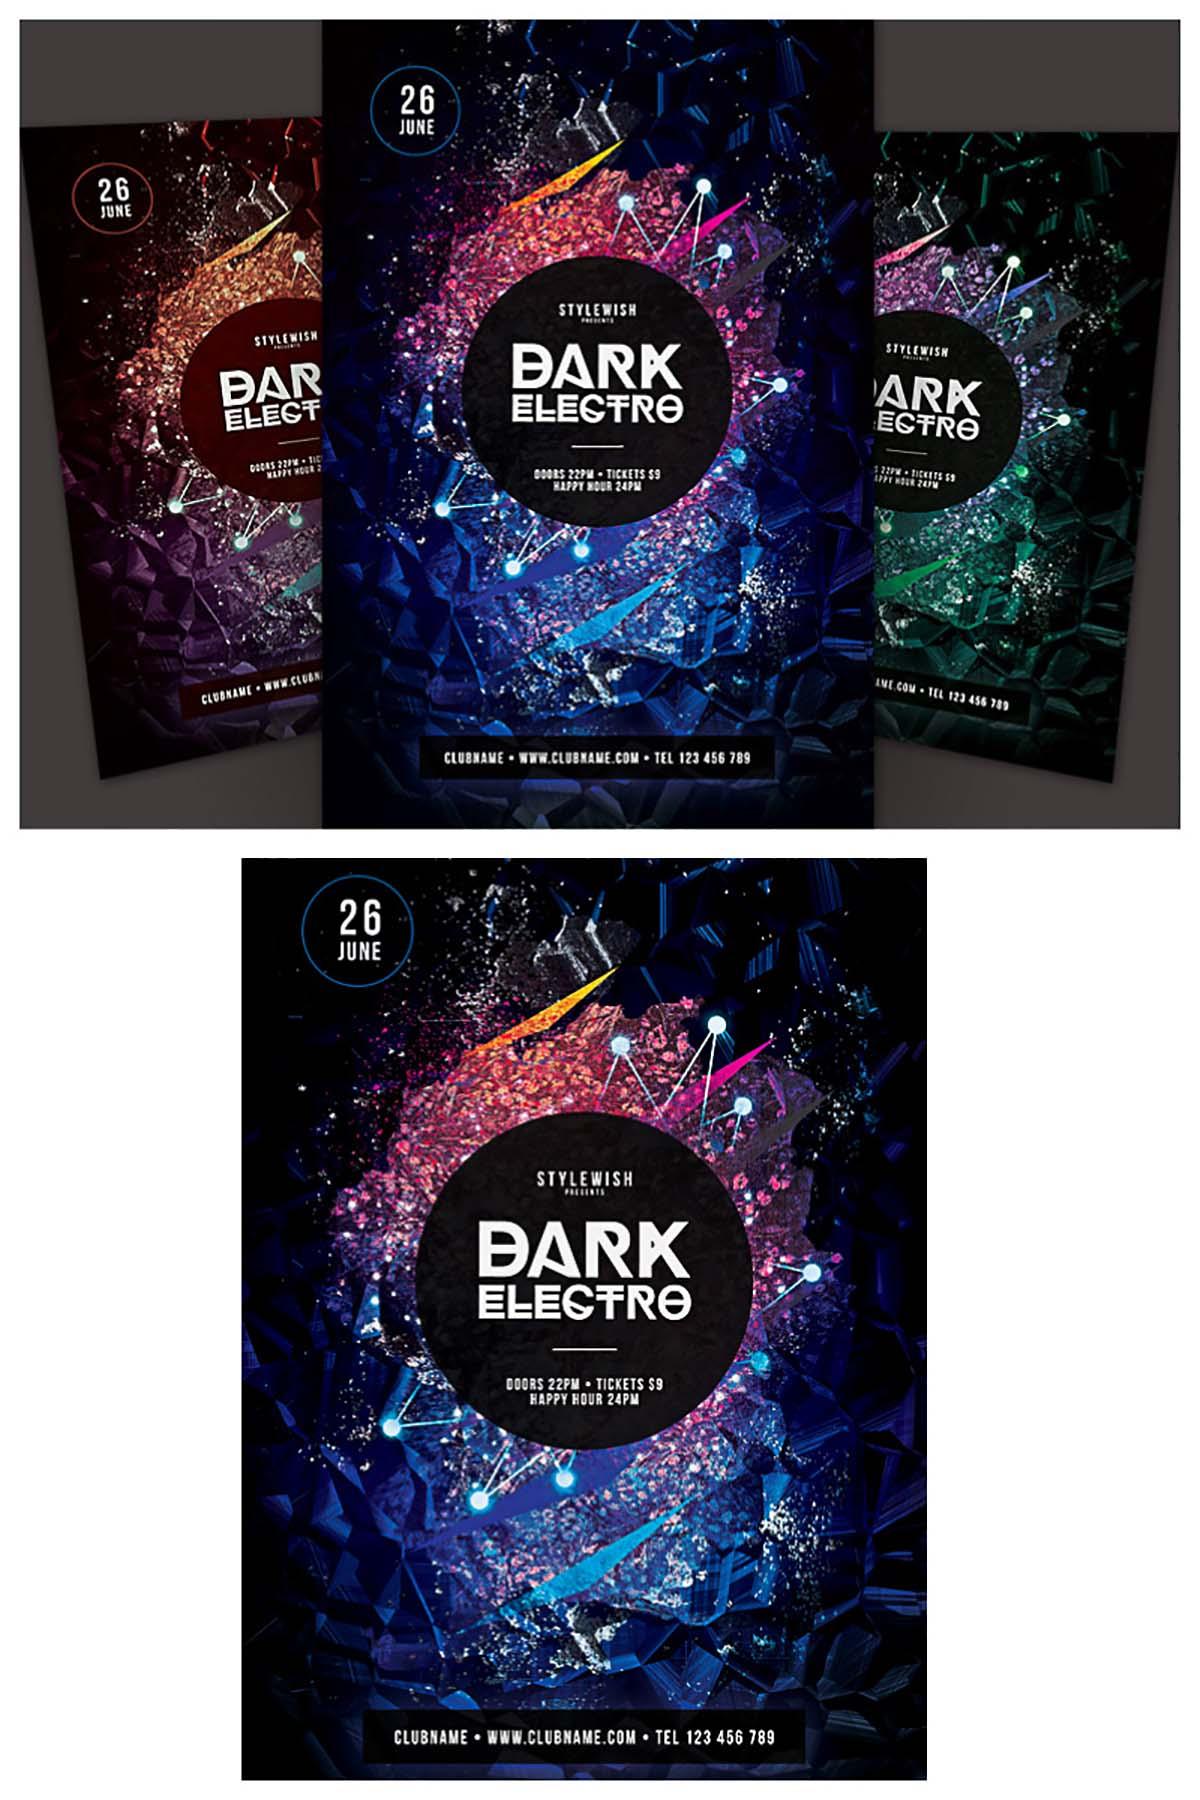 Dark electro party poster set